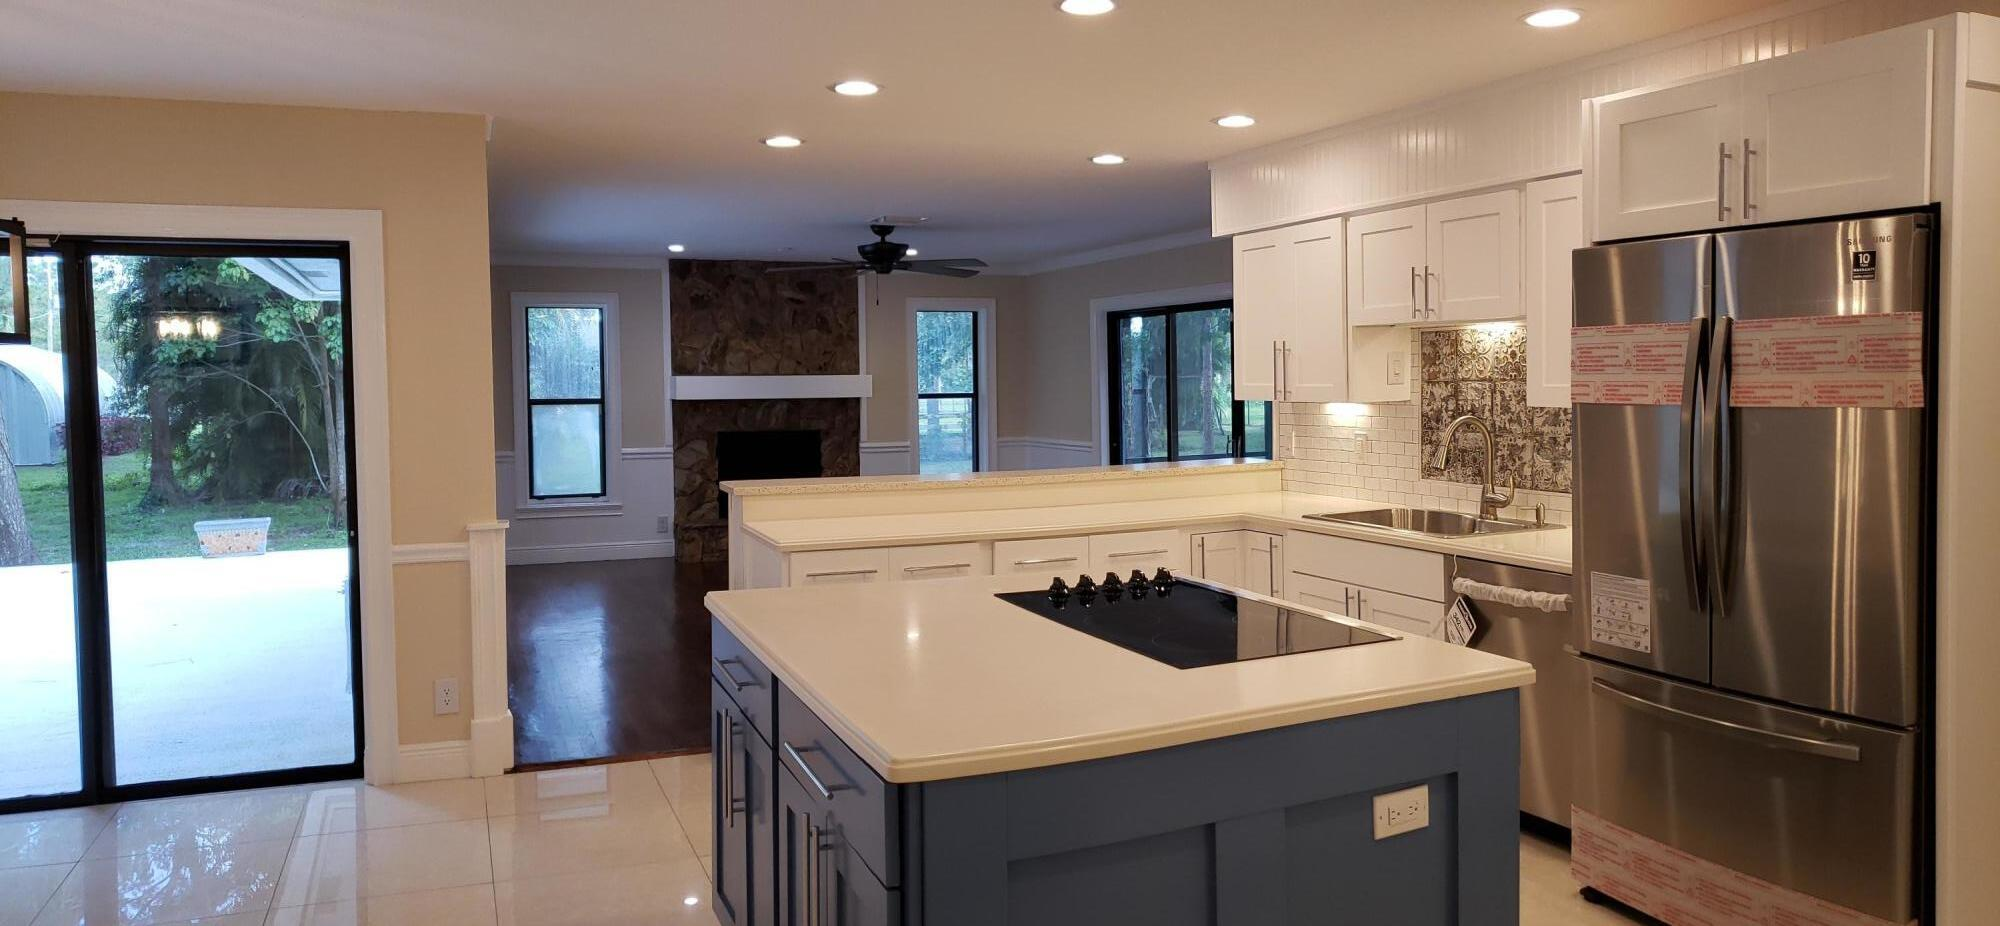 Kitchen-ALL New Appliances